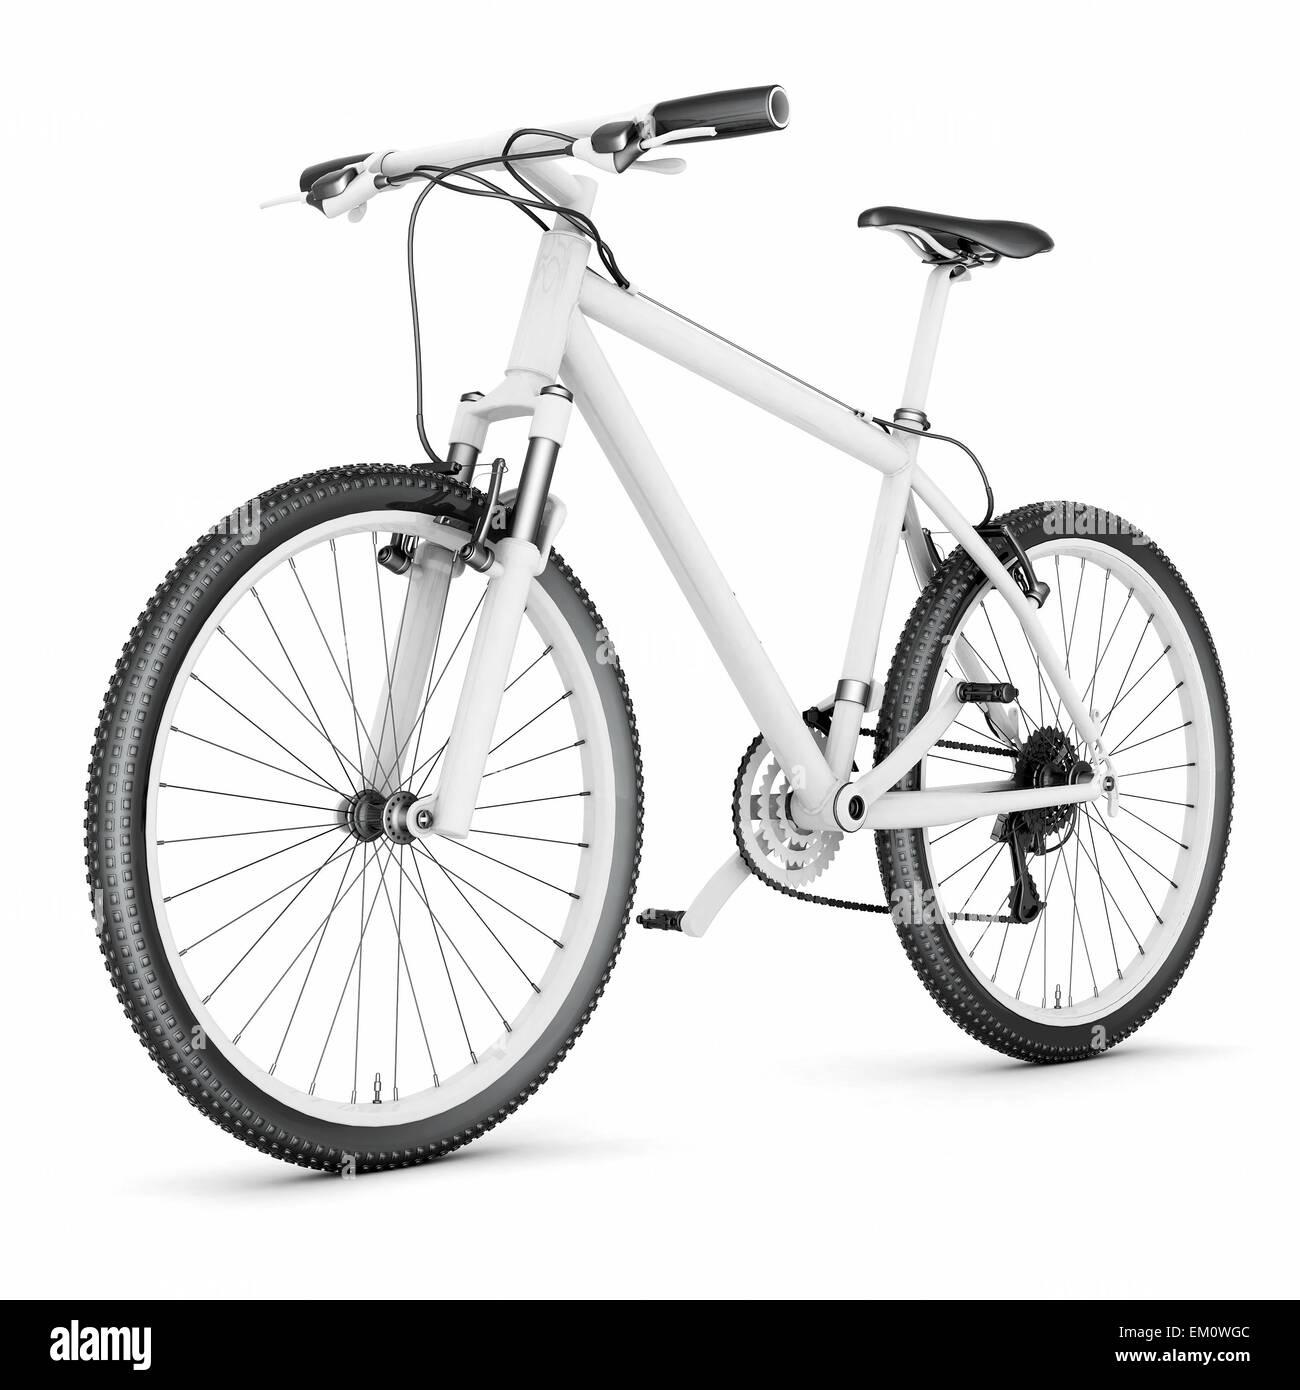 mountain bike - Stock Image